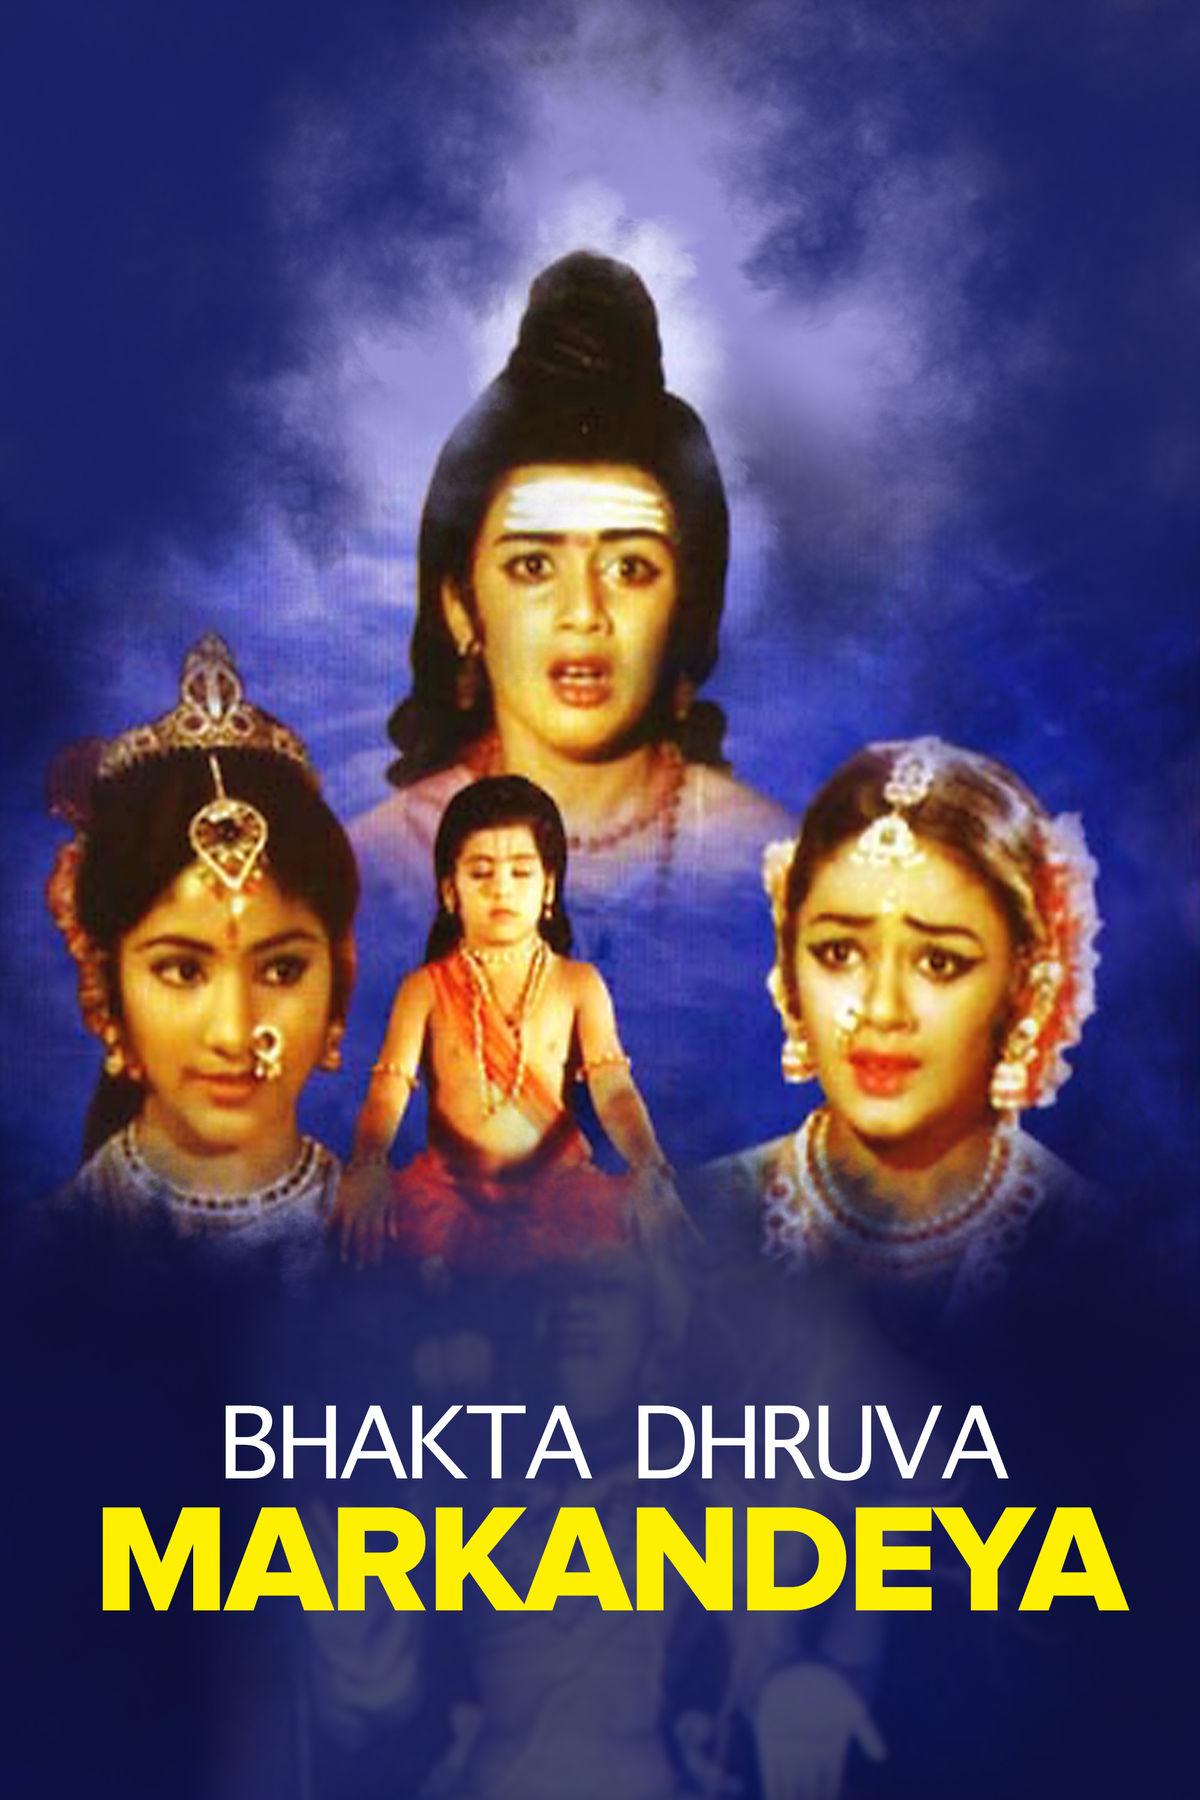 Bhakta Dhruva Markandeya